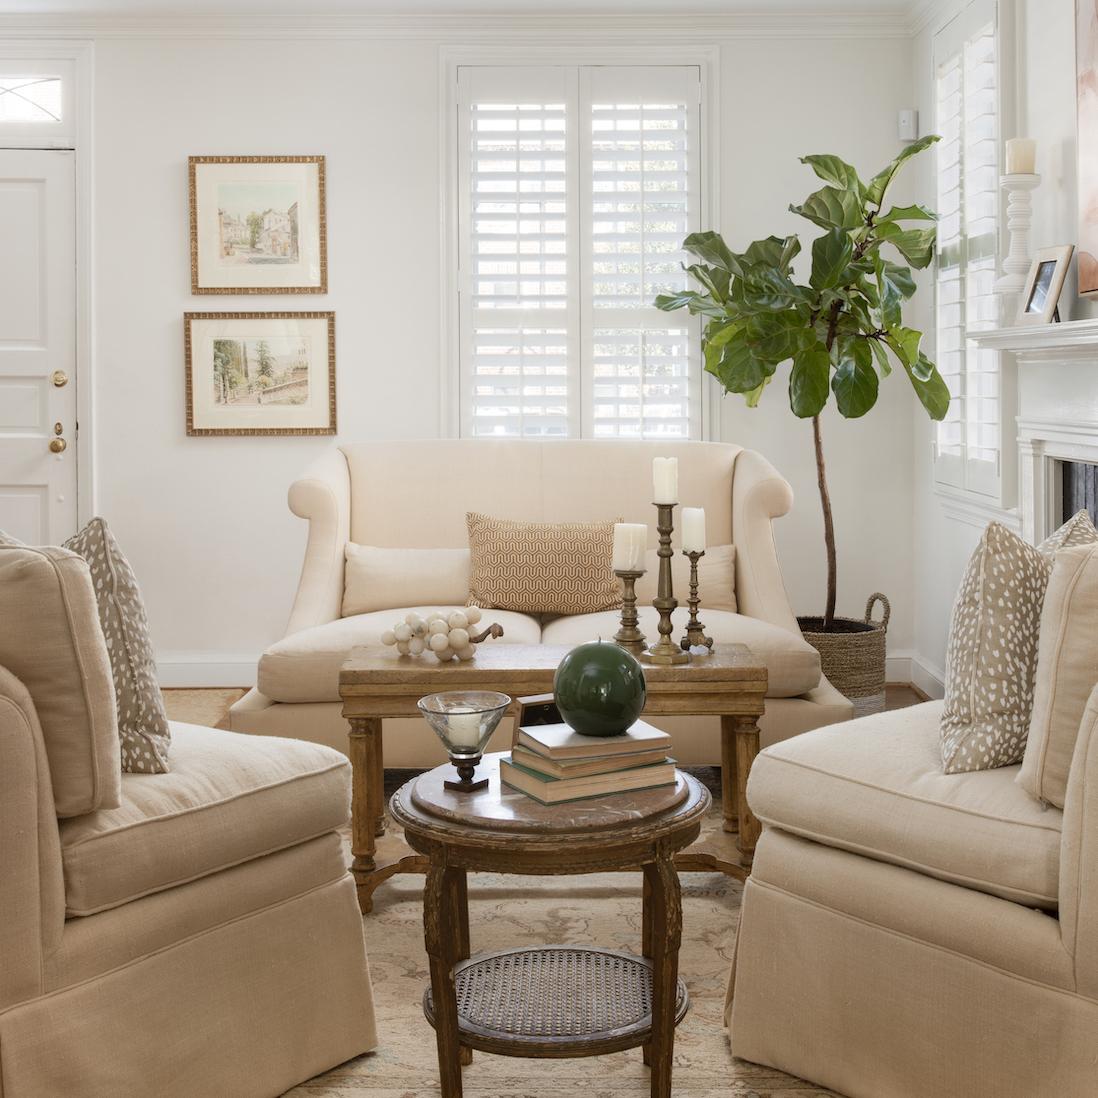 old-town-alexandria-living-room-interior-design